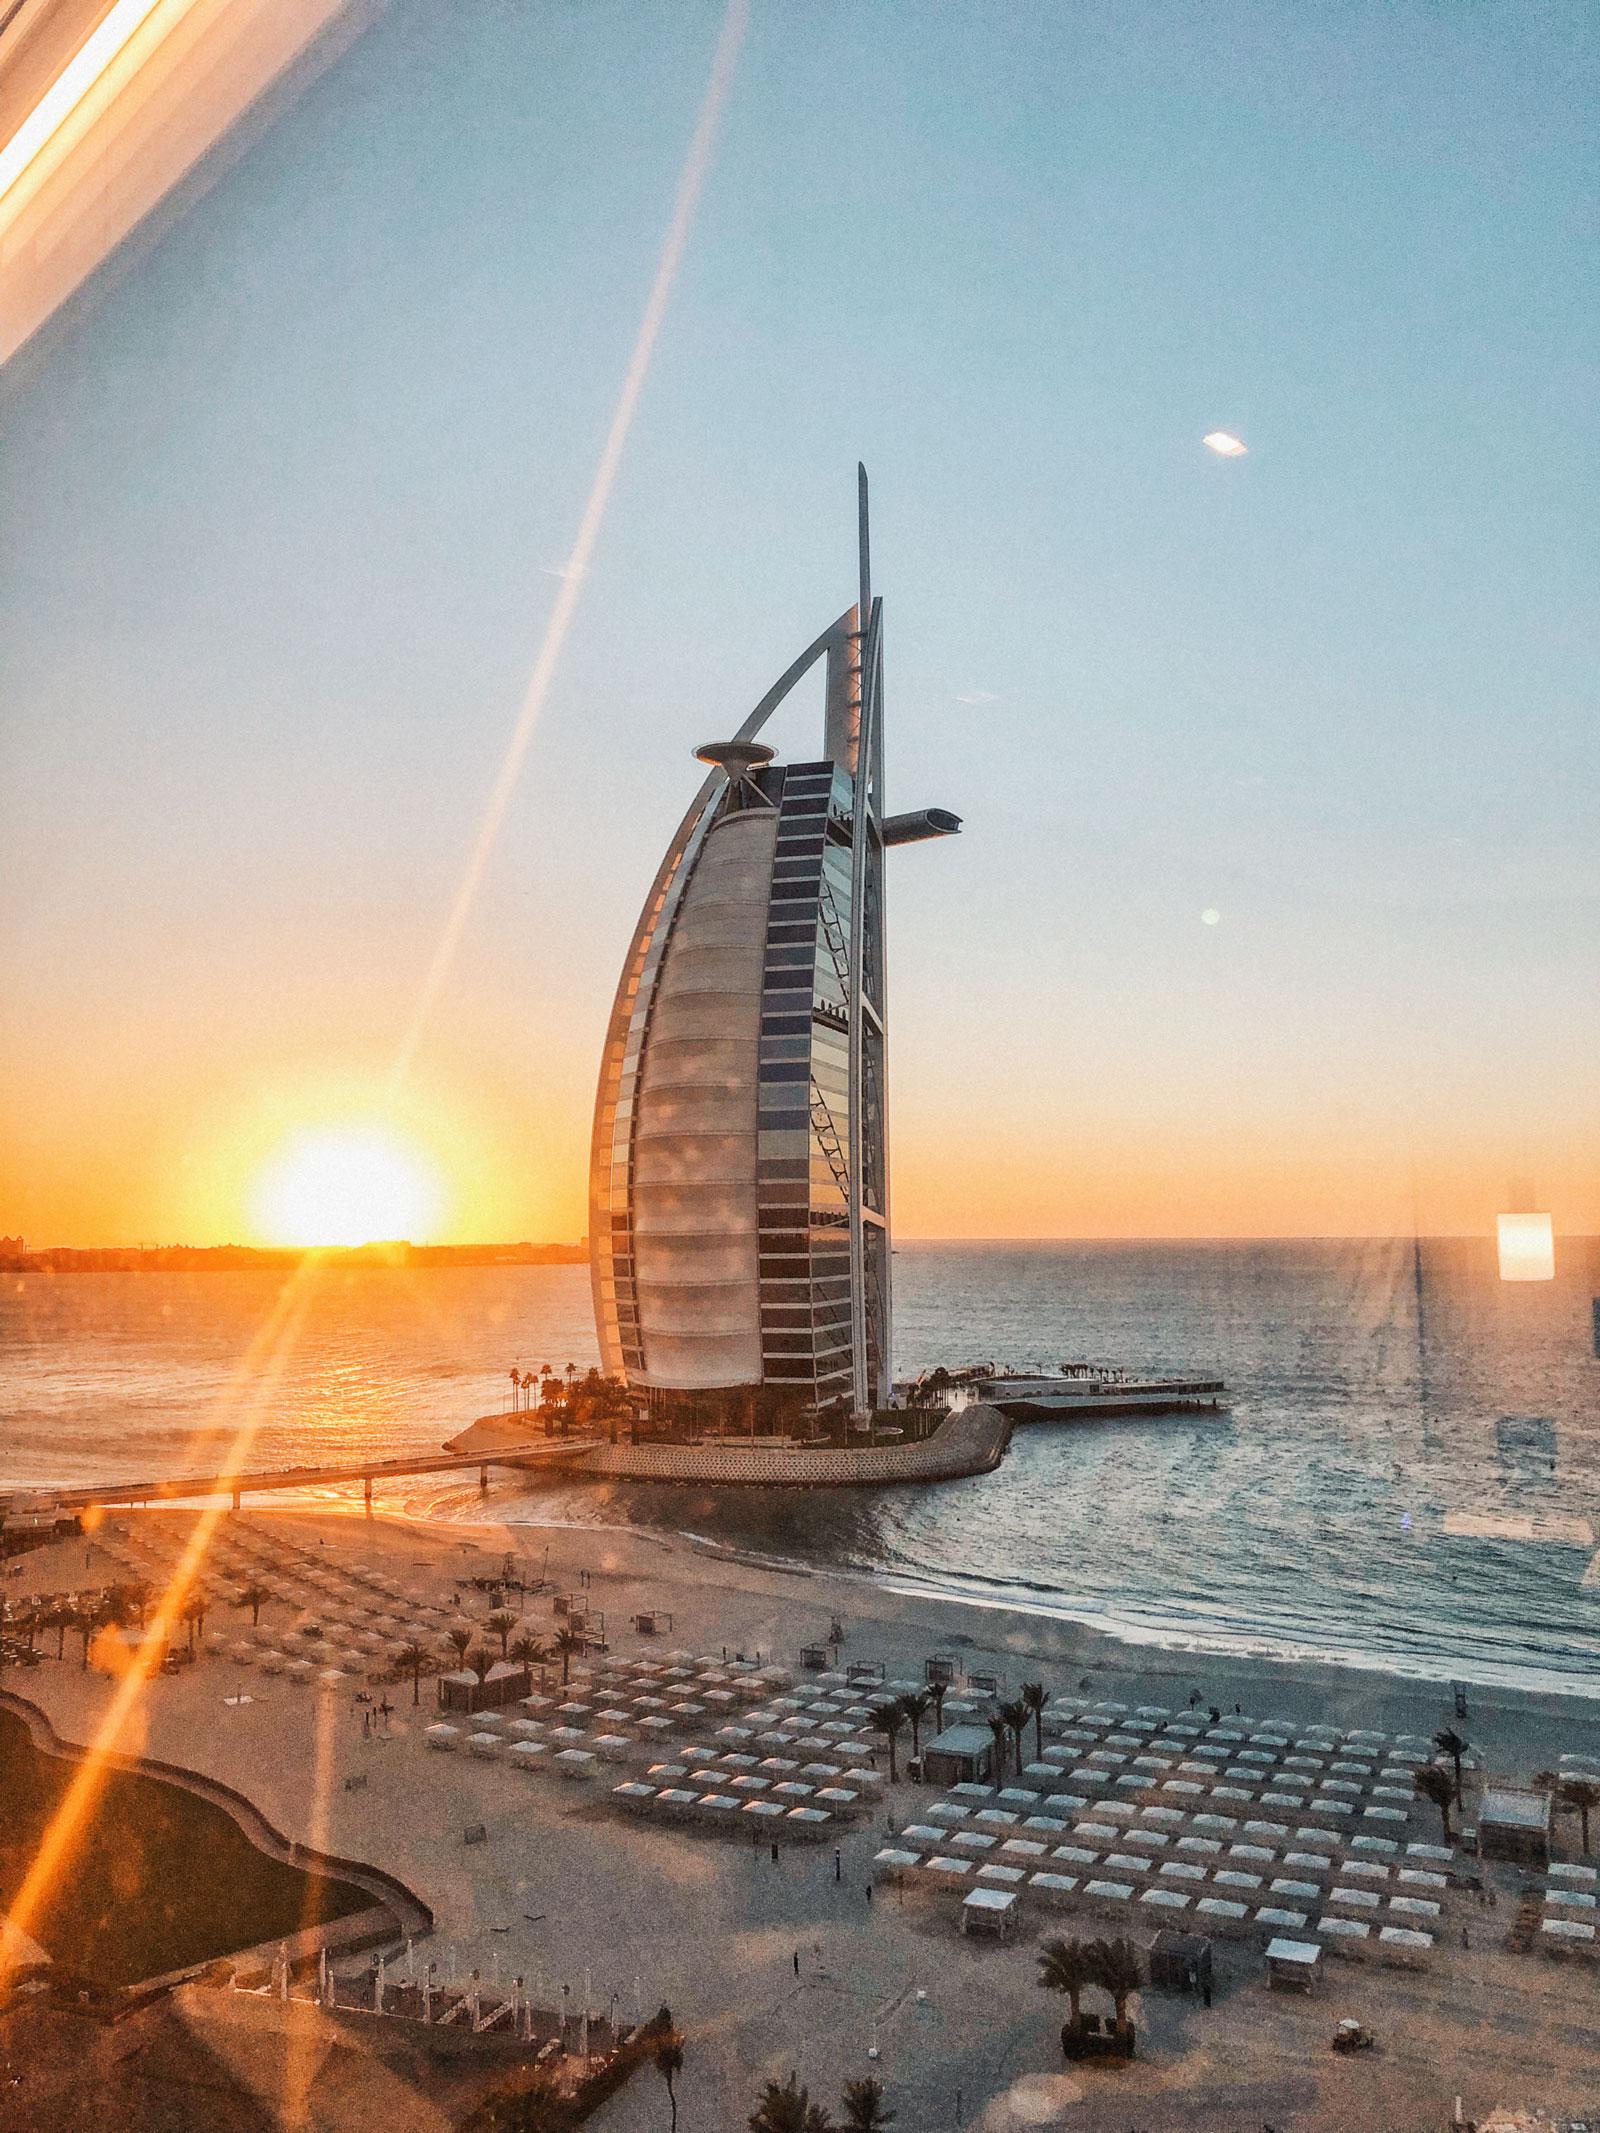 Burj Al Arab Travel Photography / Dubai Travel Tips